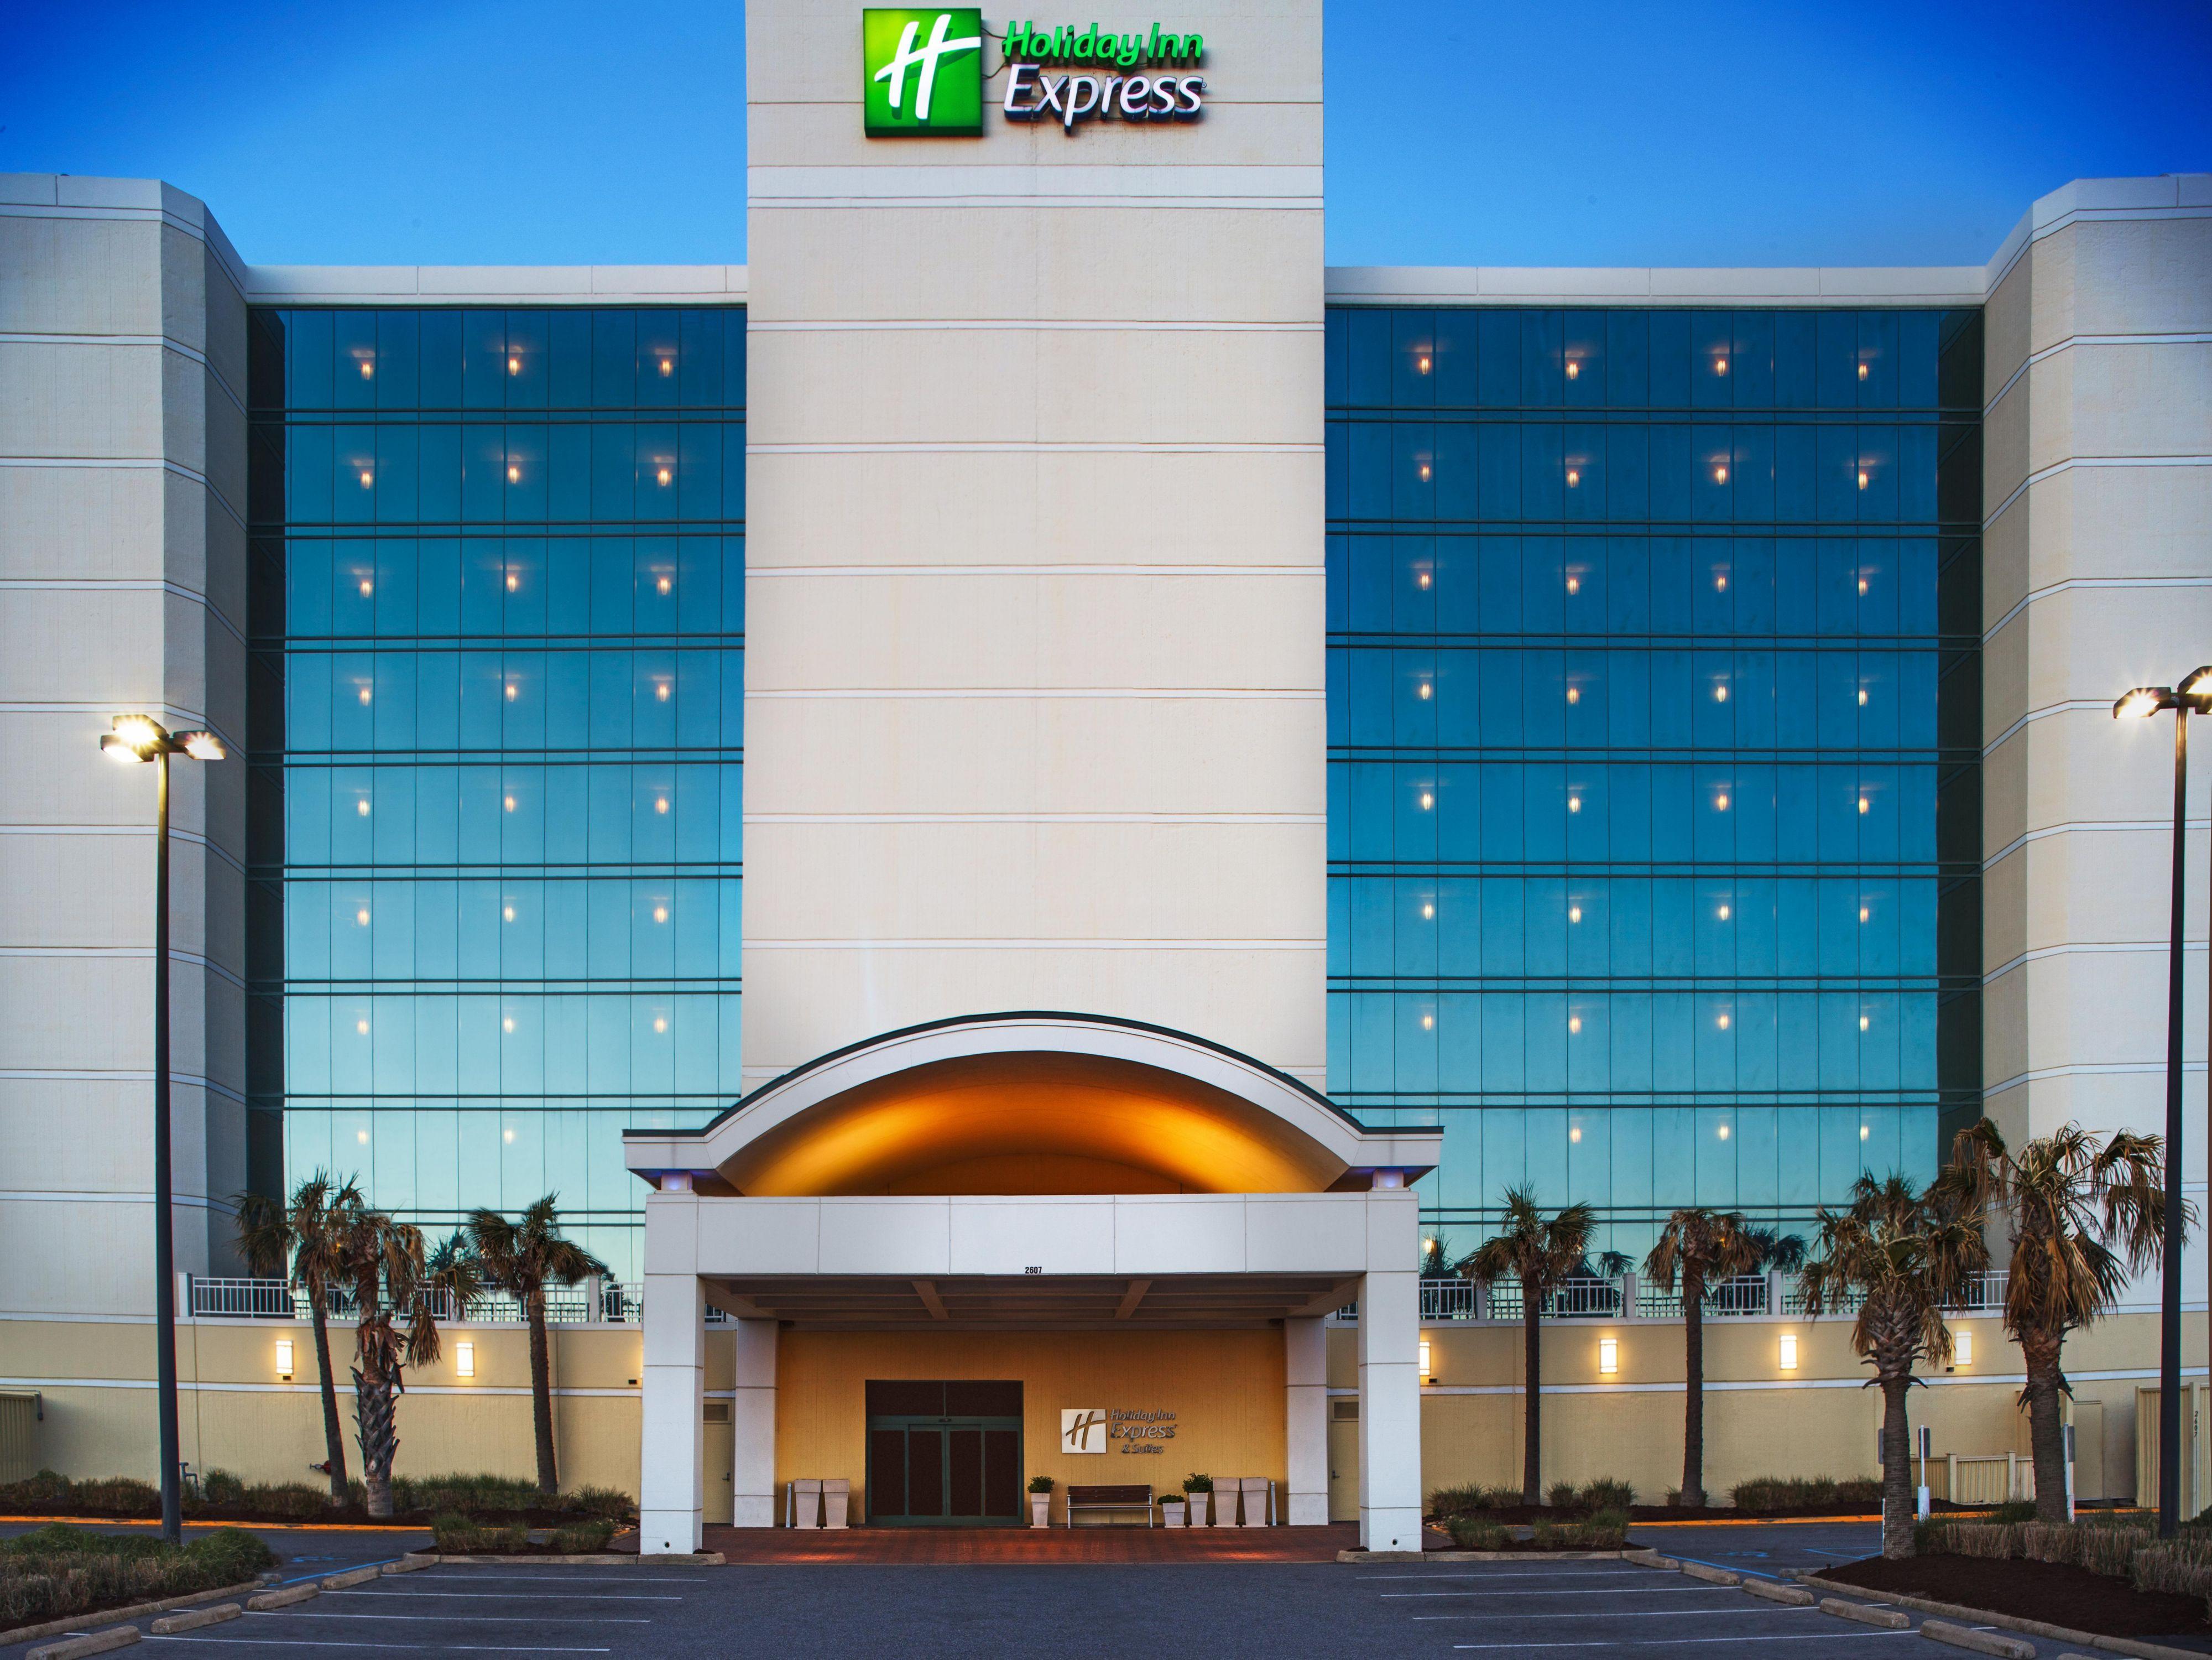 Find Norfolk Hotels | Top 21 Hotels in Norfolk, VA by IHG